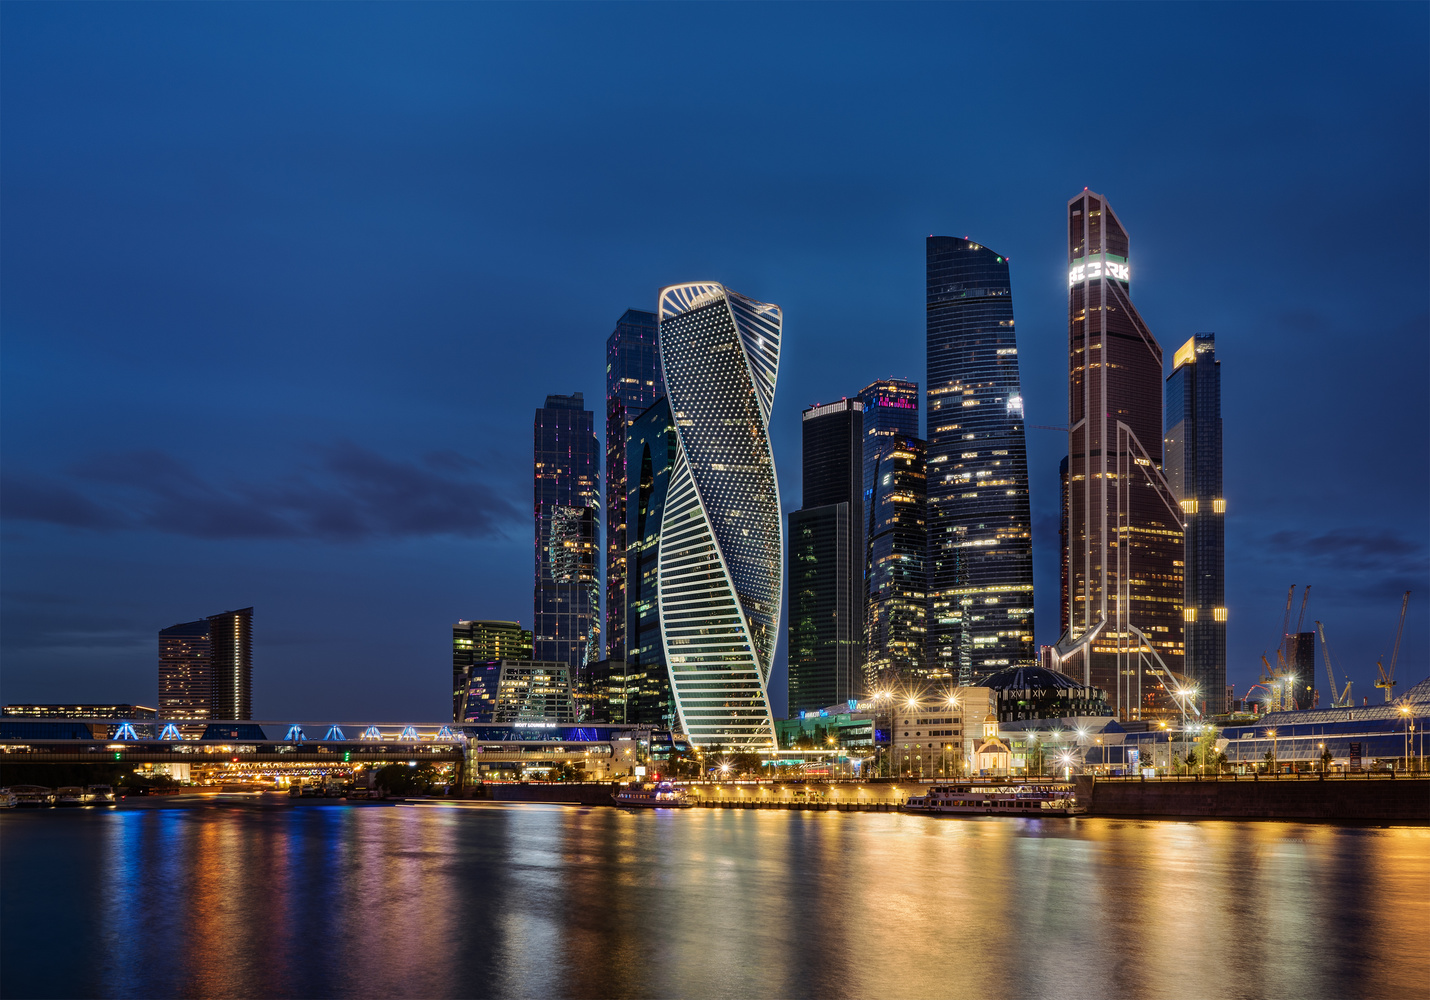 Moscow City Blue Hour 01 by Gleb Karpetkin